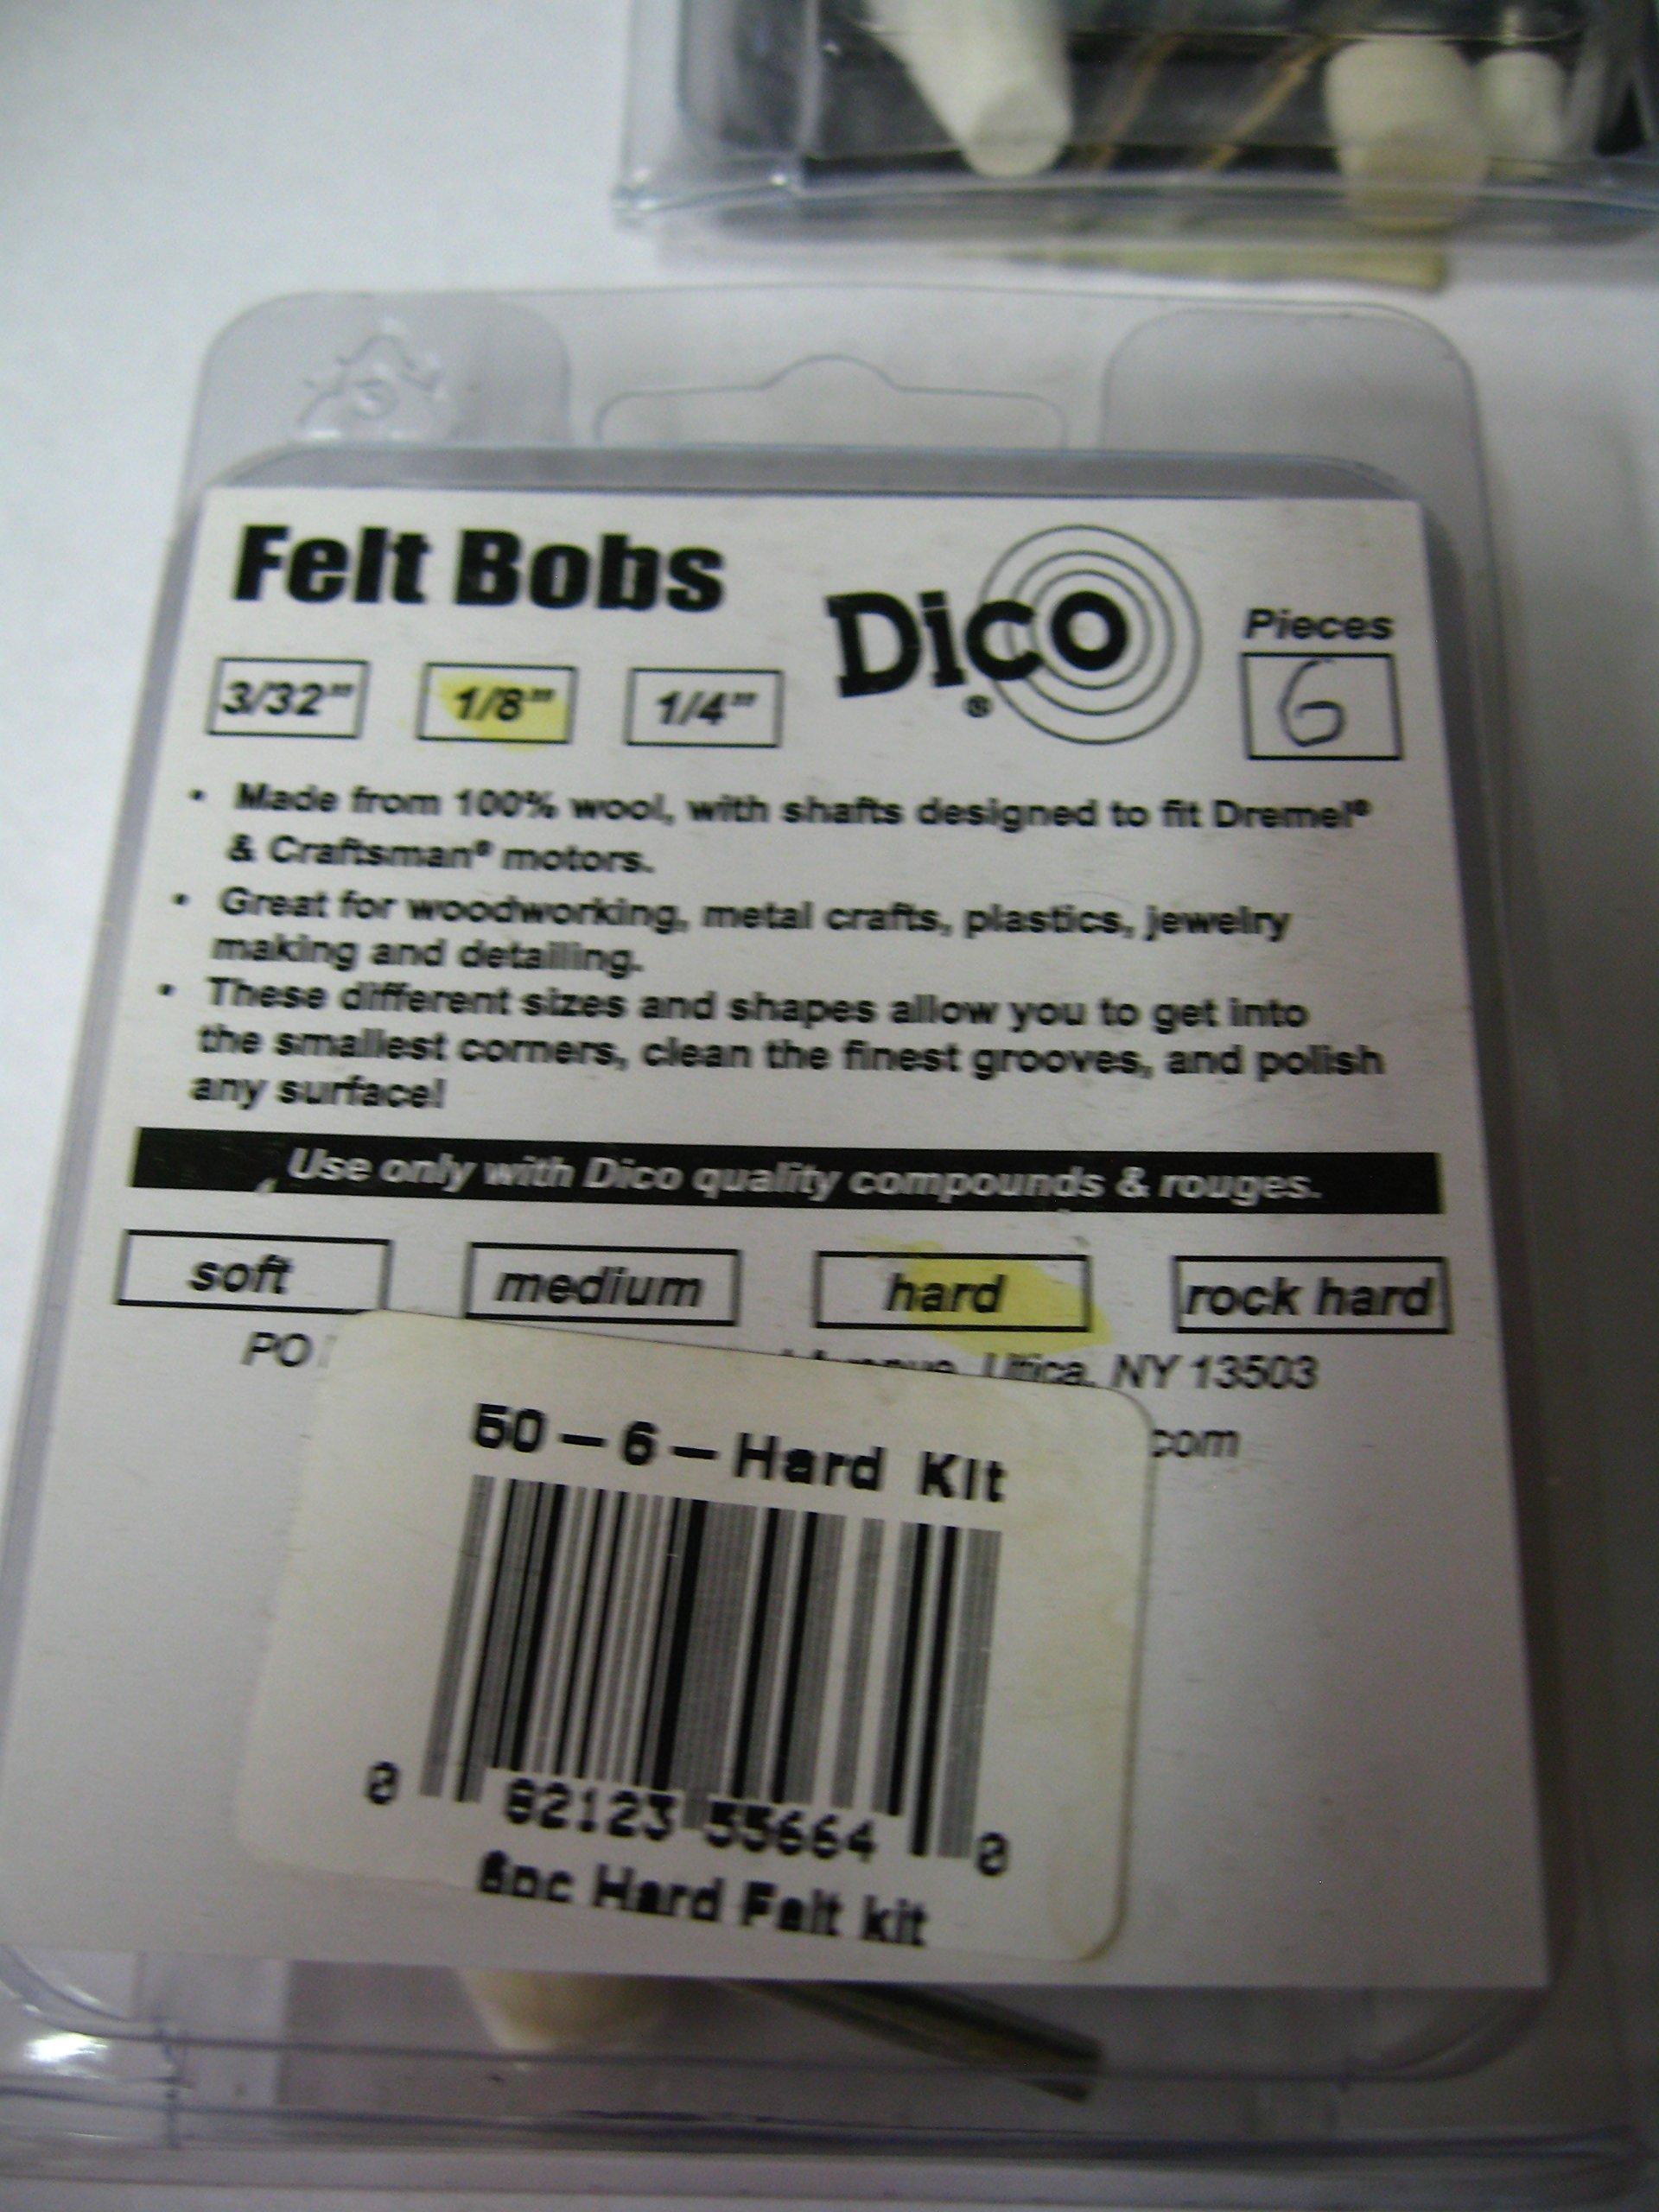 (6-packs of 6) Dico Products Rotary Tool Felt Bobs Assortment (36 Pcs) 1/8 ''